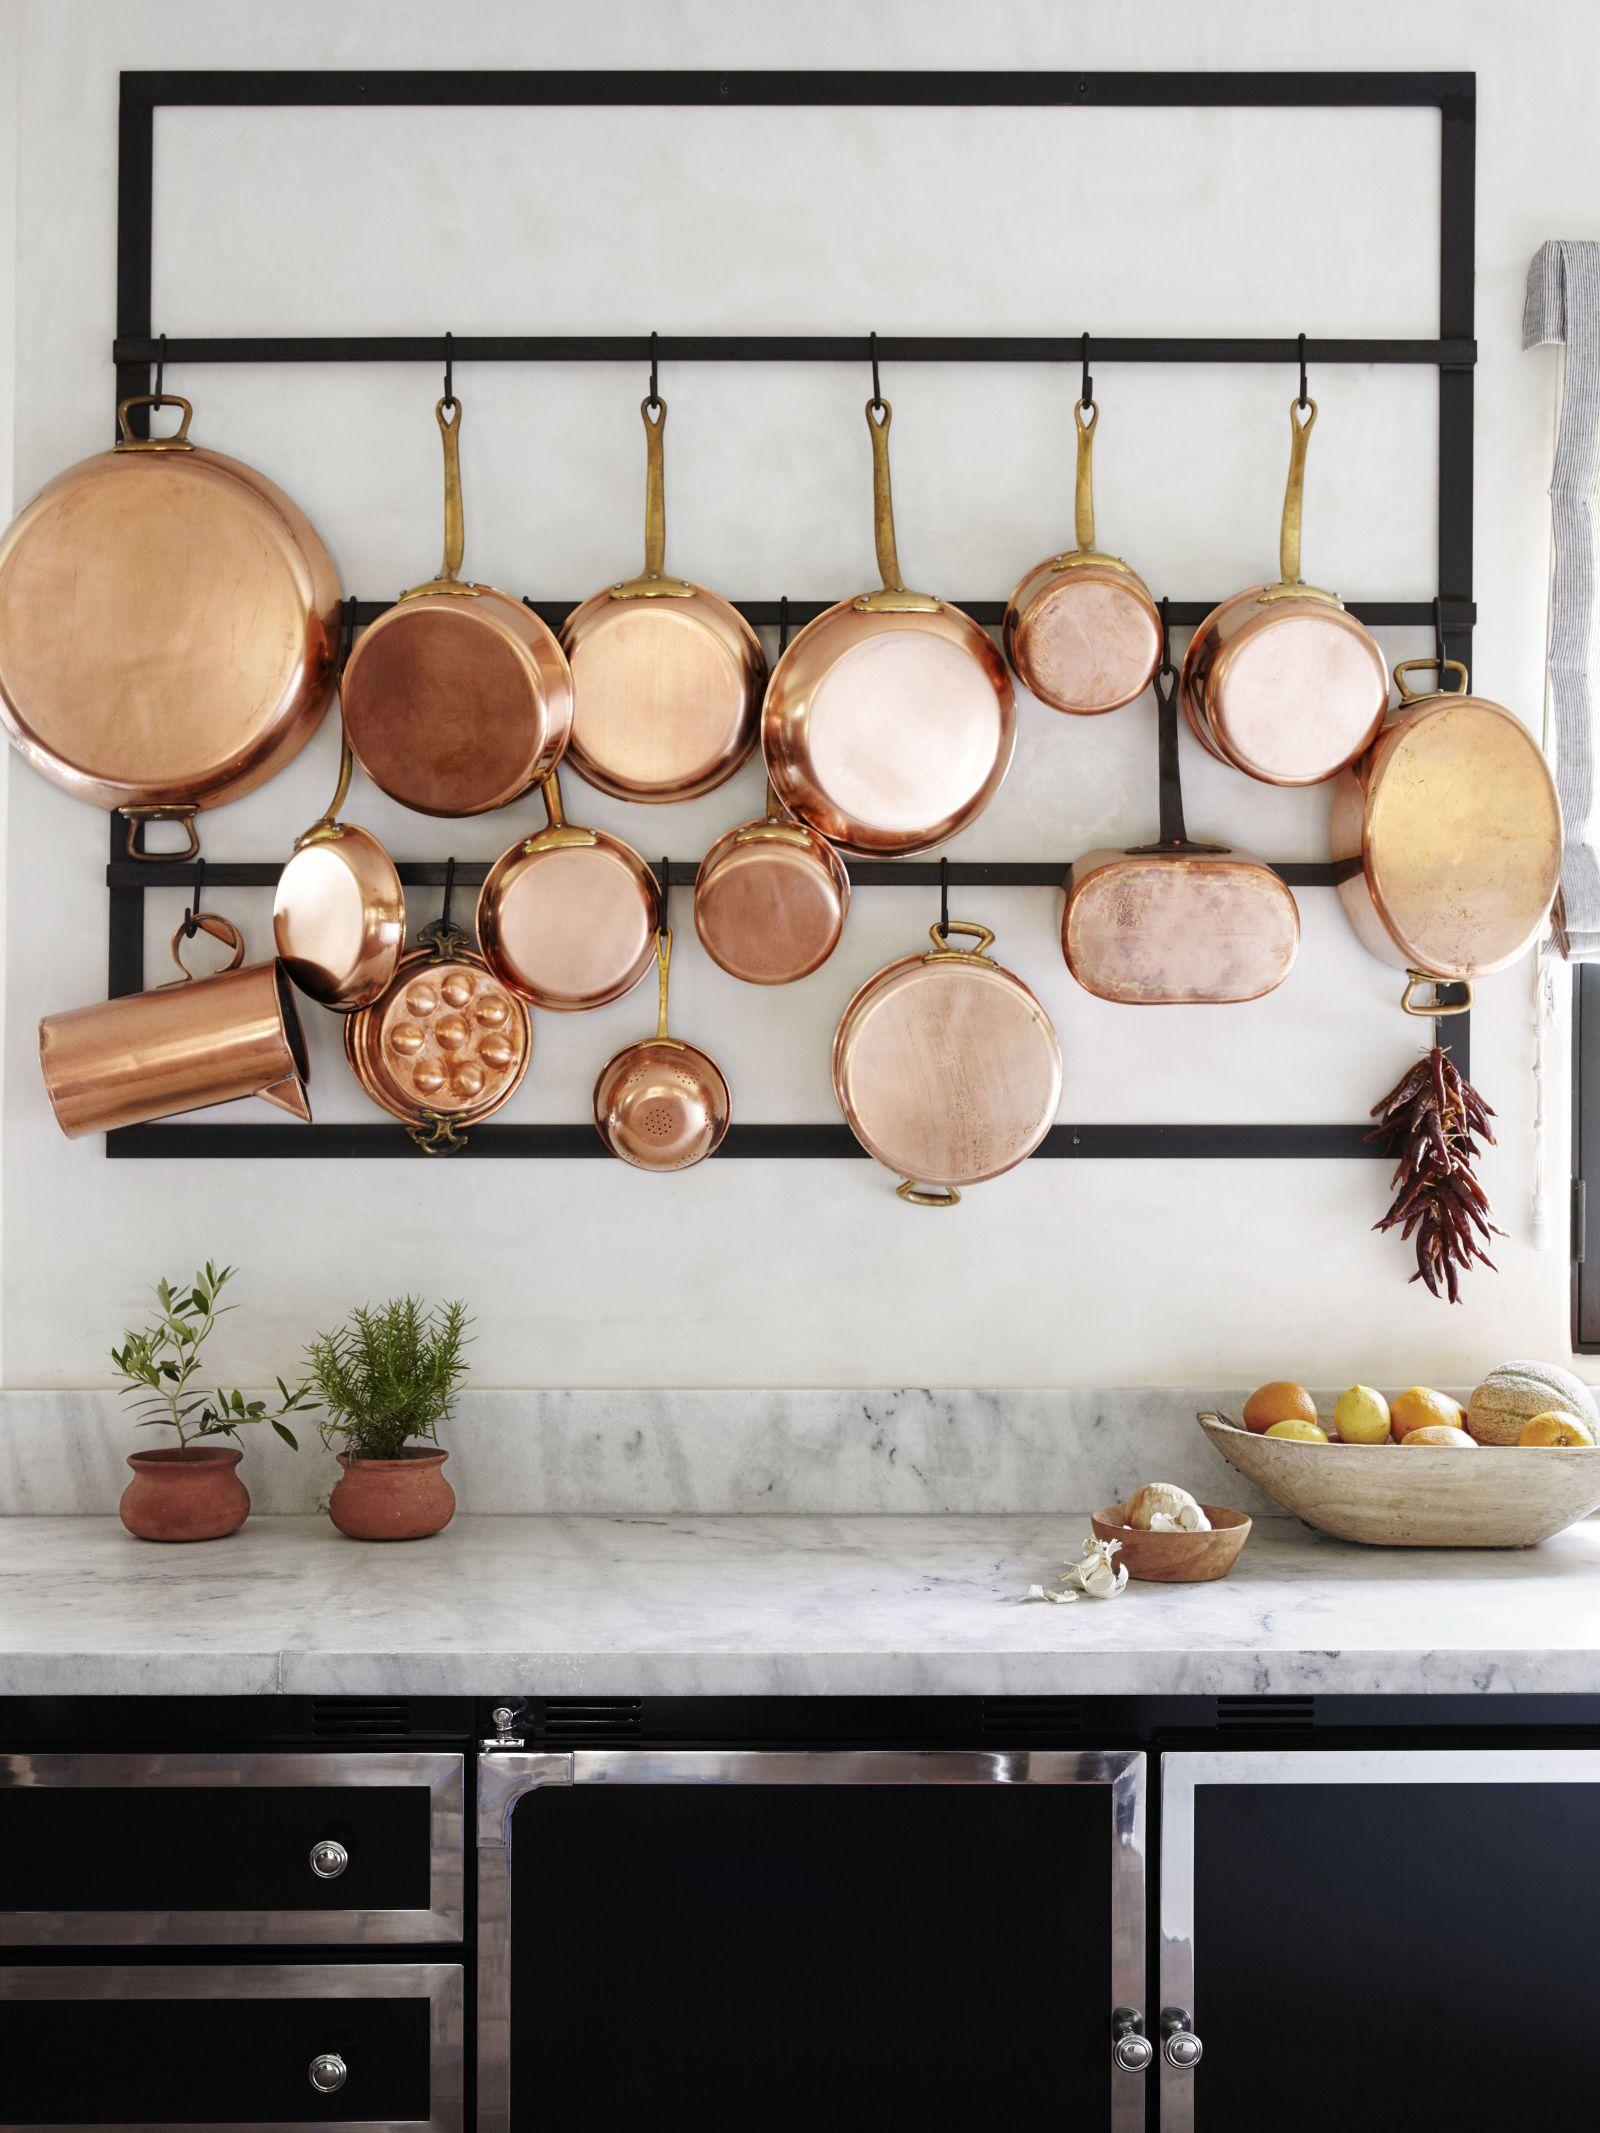 Ellen Pompeo\'s Secrets to a Cozy L.A. Home | Rote häuser, Küche und ...